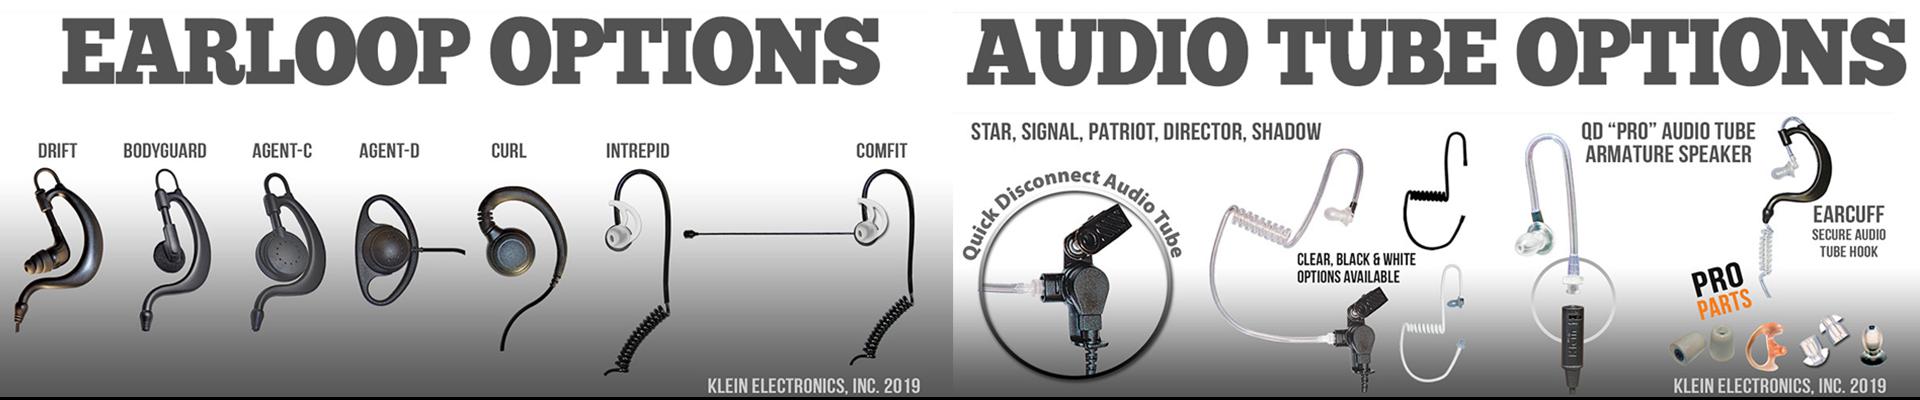 earpieces2.png